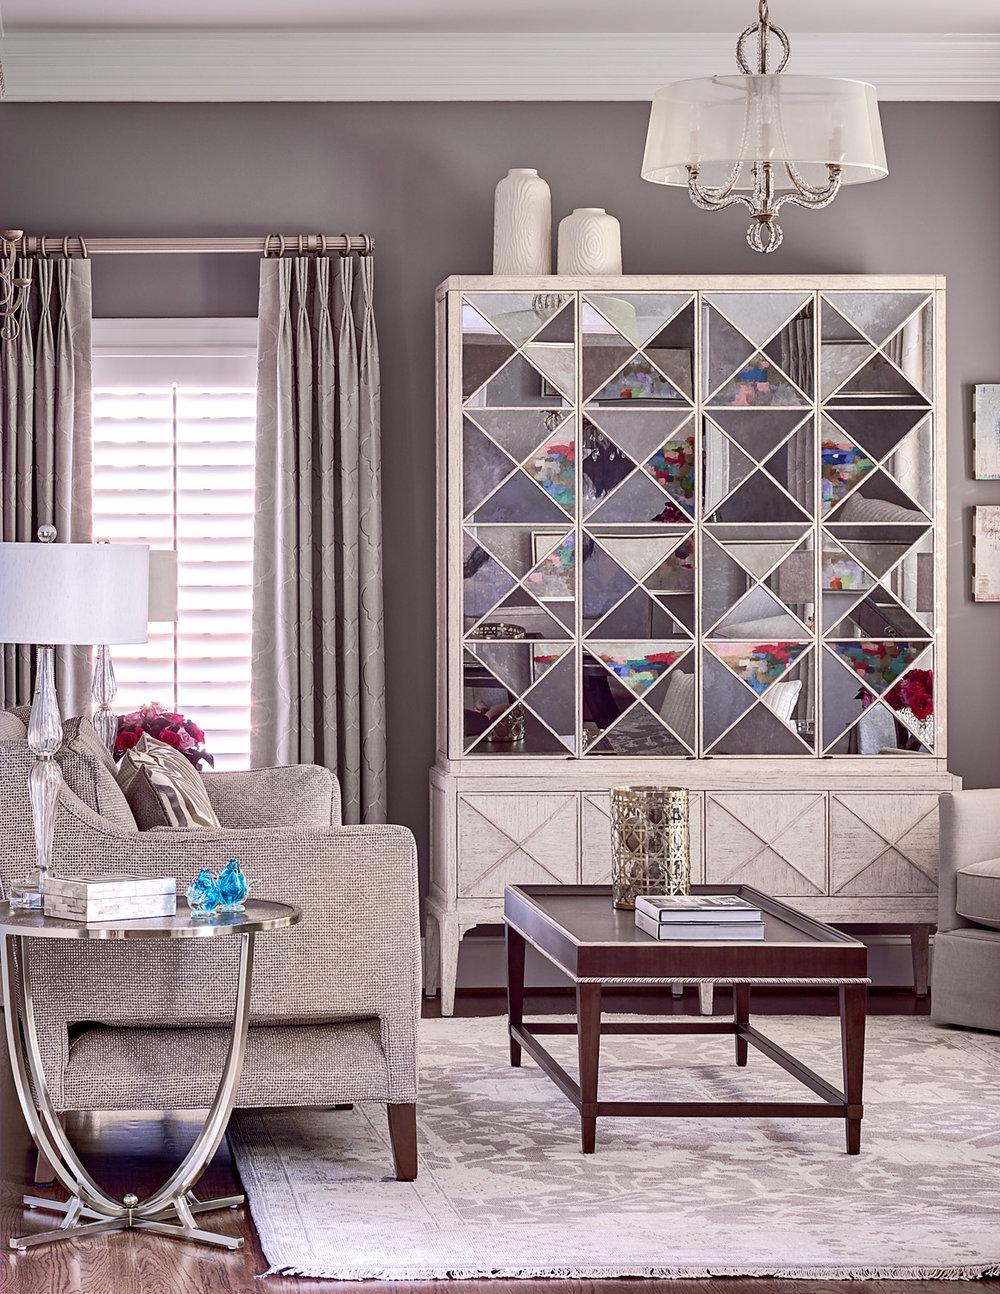 interior-design-ballantyne-cream-gold-formal-living-room-charlotte-nc-1.jpg.jpg